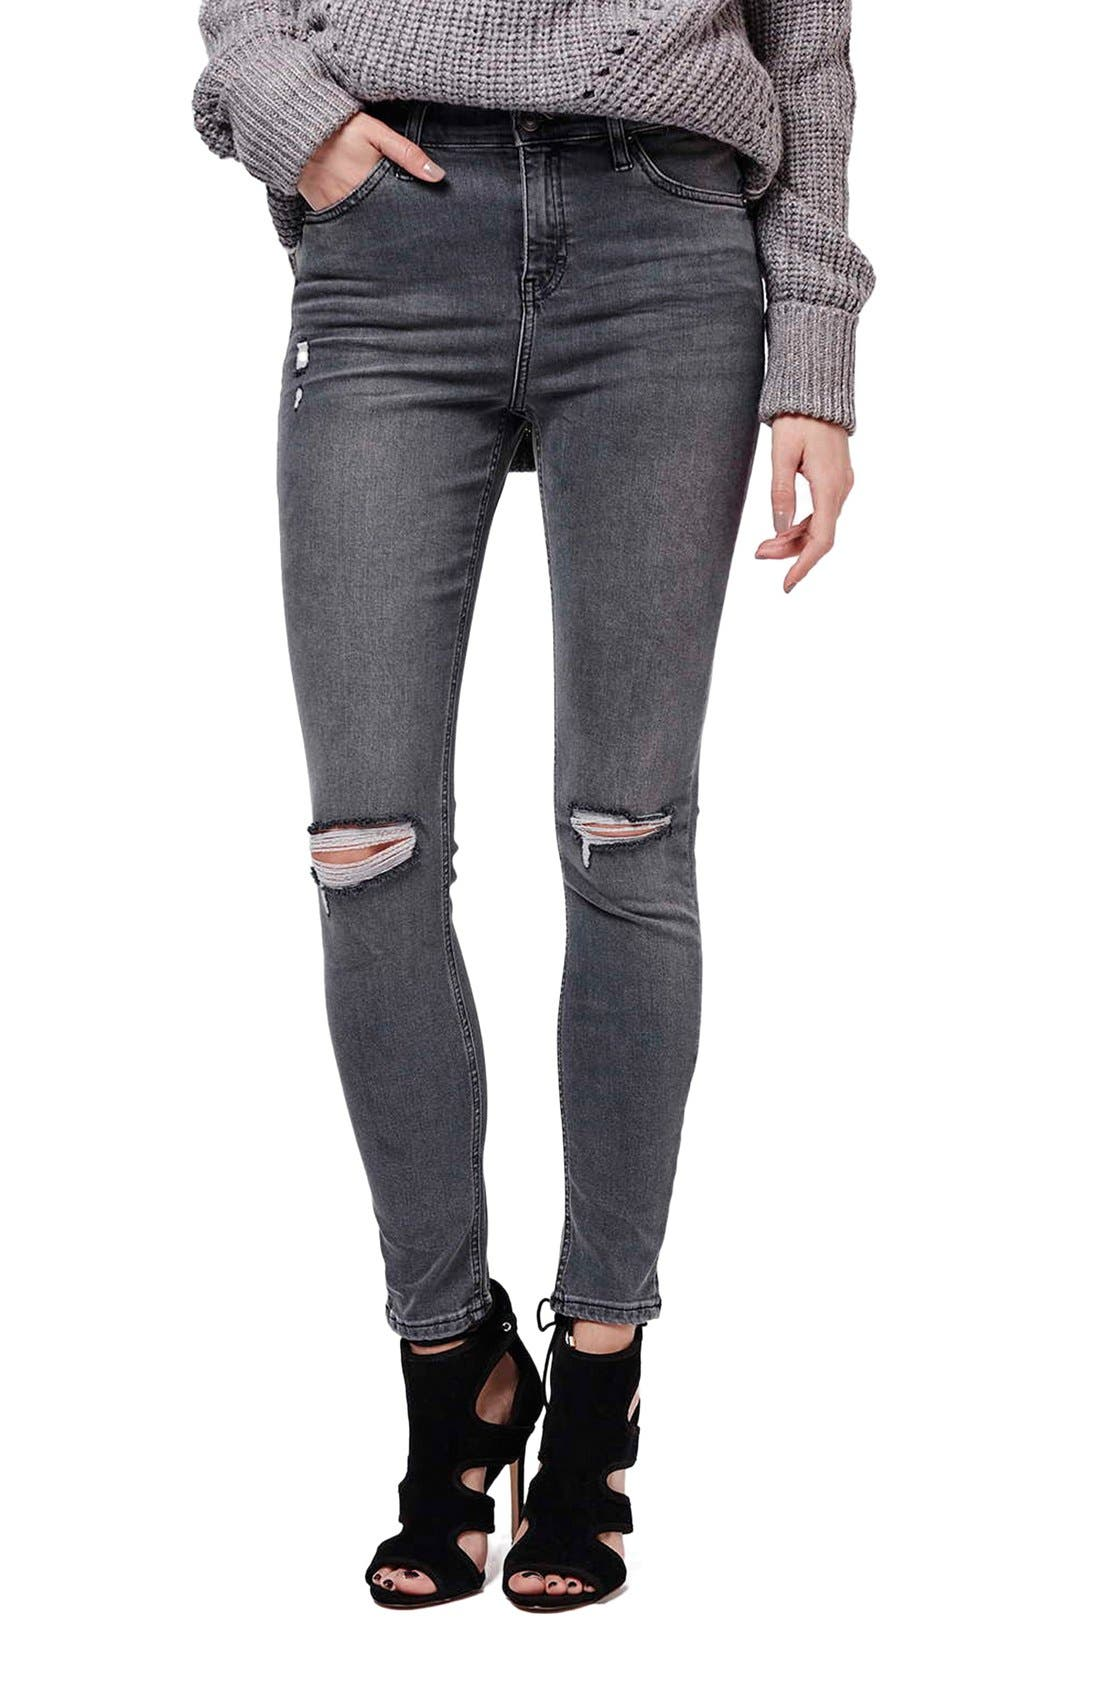 Alternate Image 1 Selected - Topshop 'Jamie' Ripped Skinny Jeans (Grey)